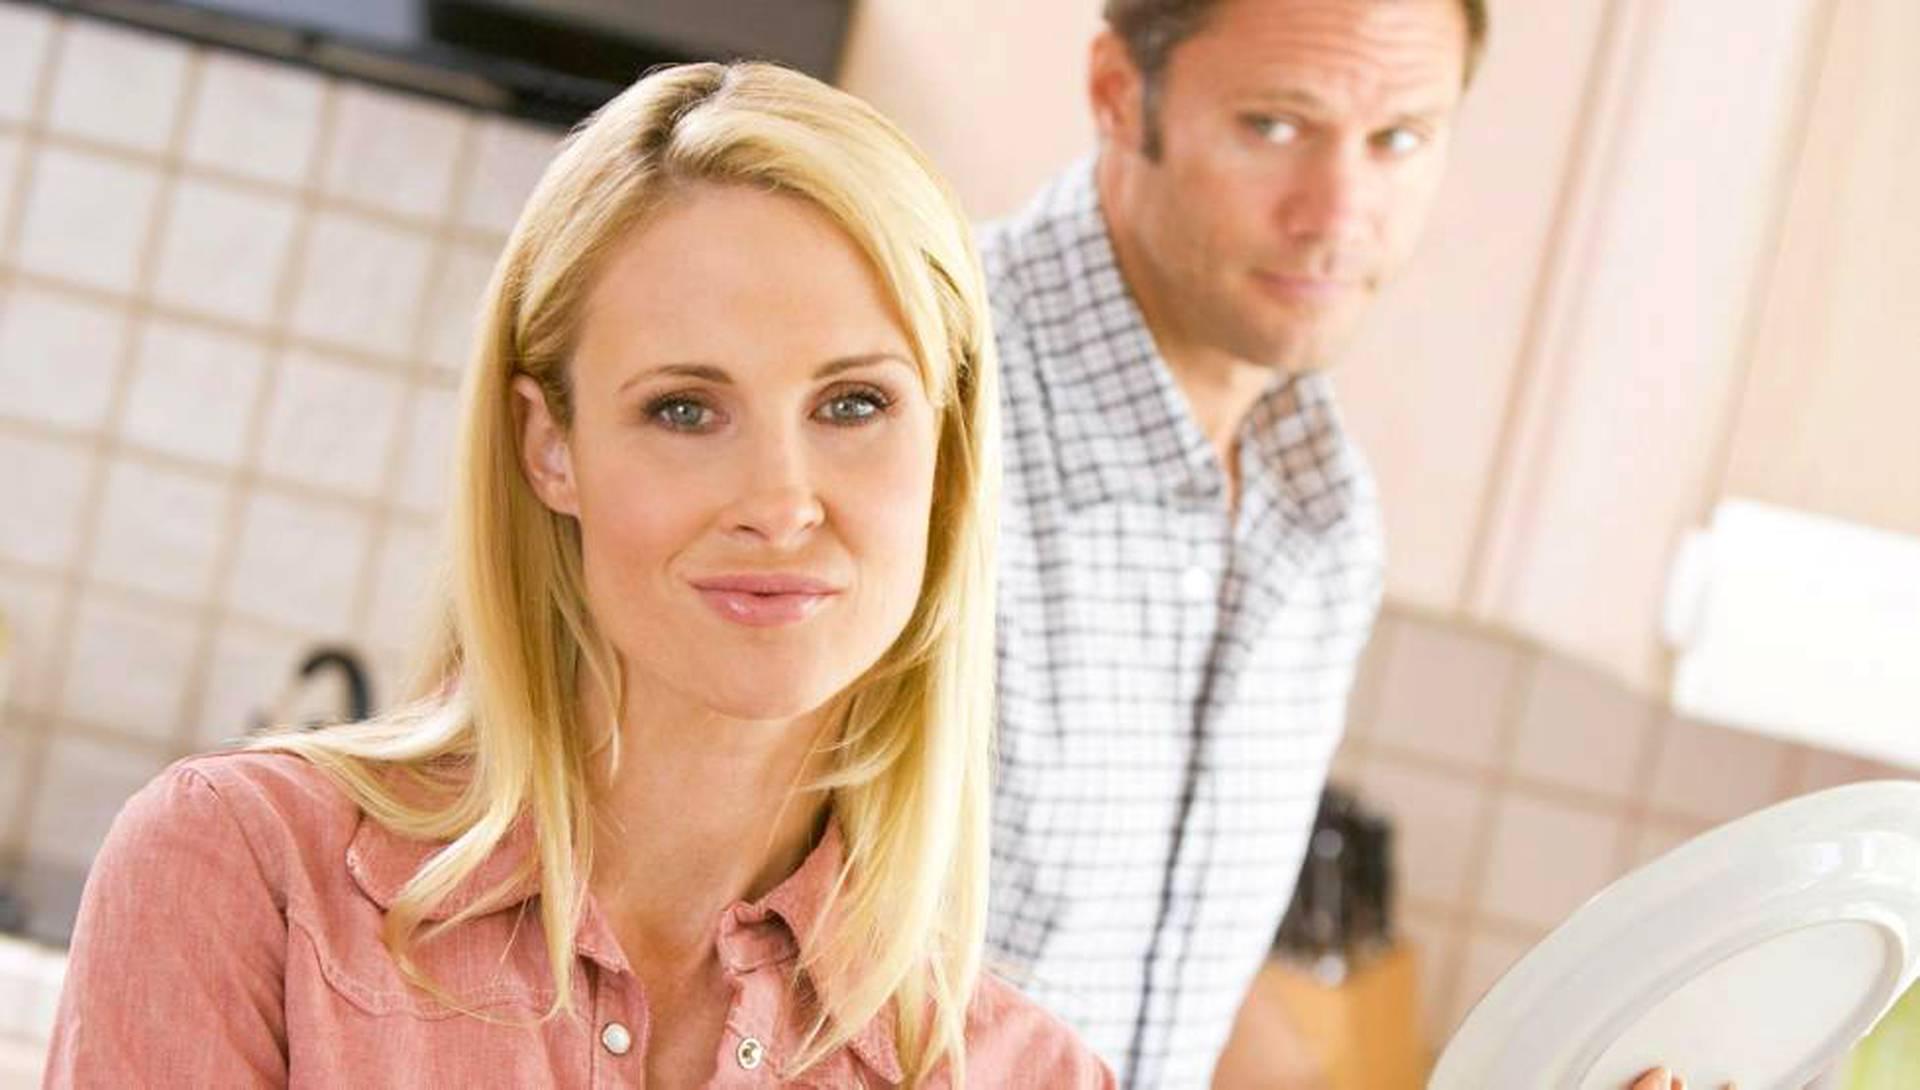 dating site ei-monogamy